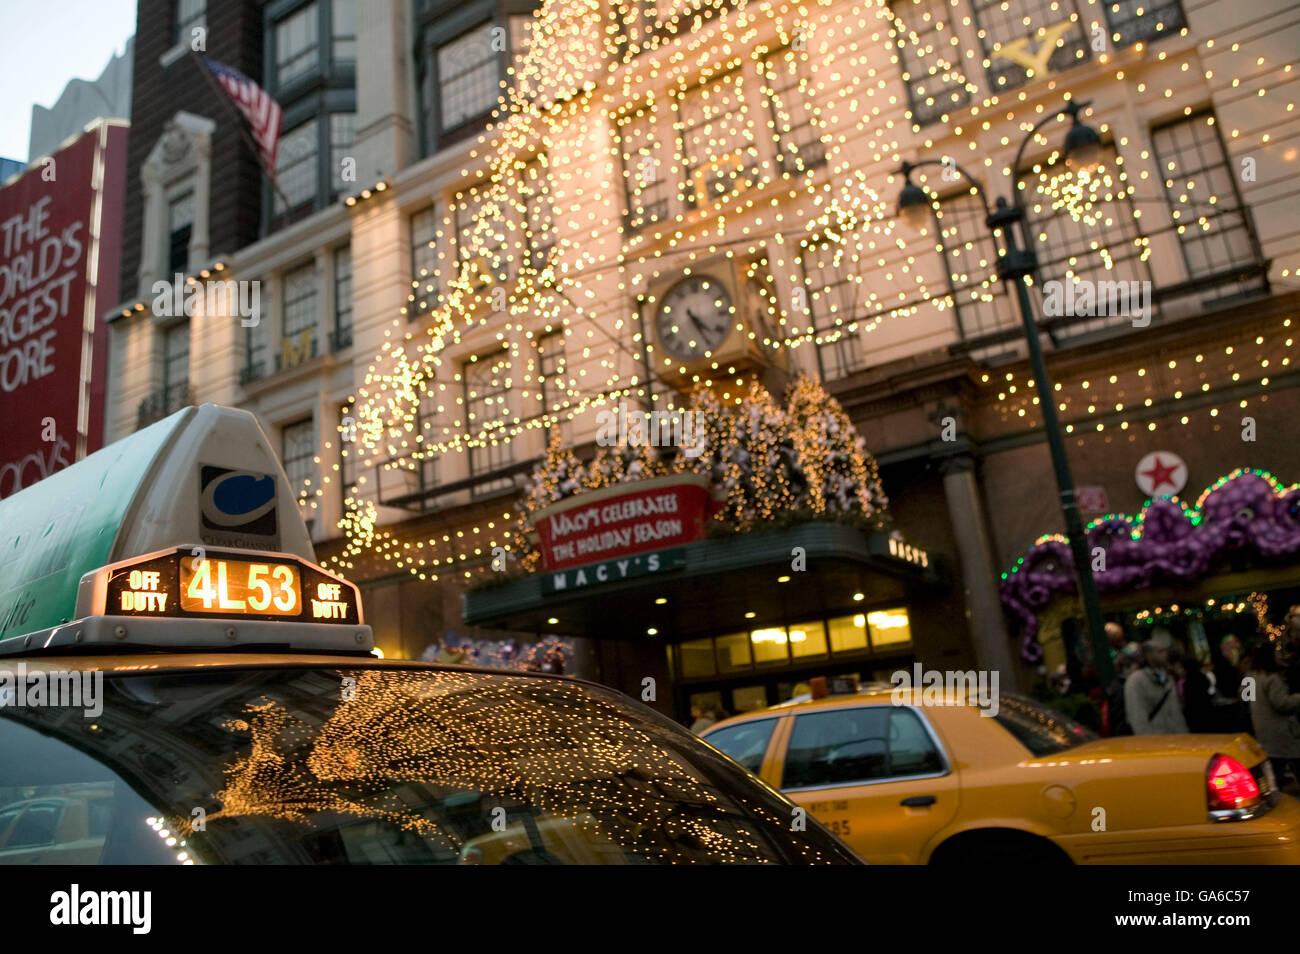 Macys Christmas Shopper Stock Photos & Macys Christmas Shopper Stock ...